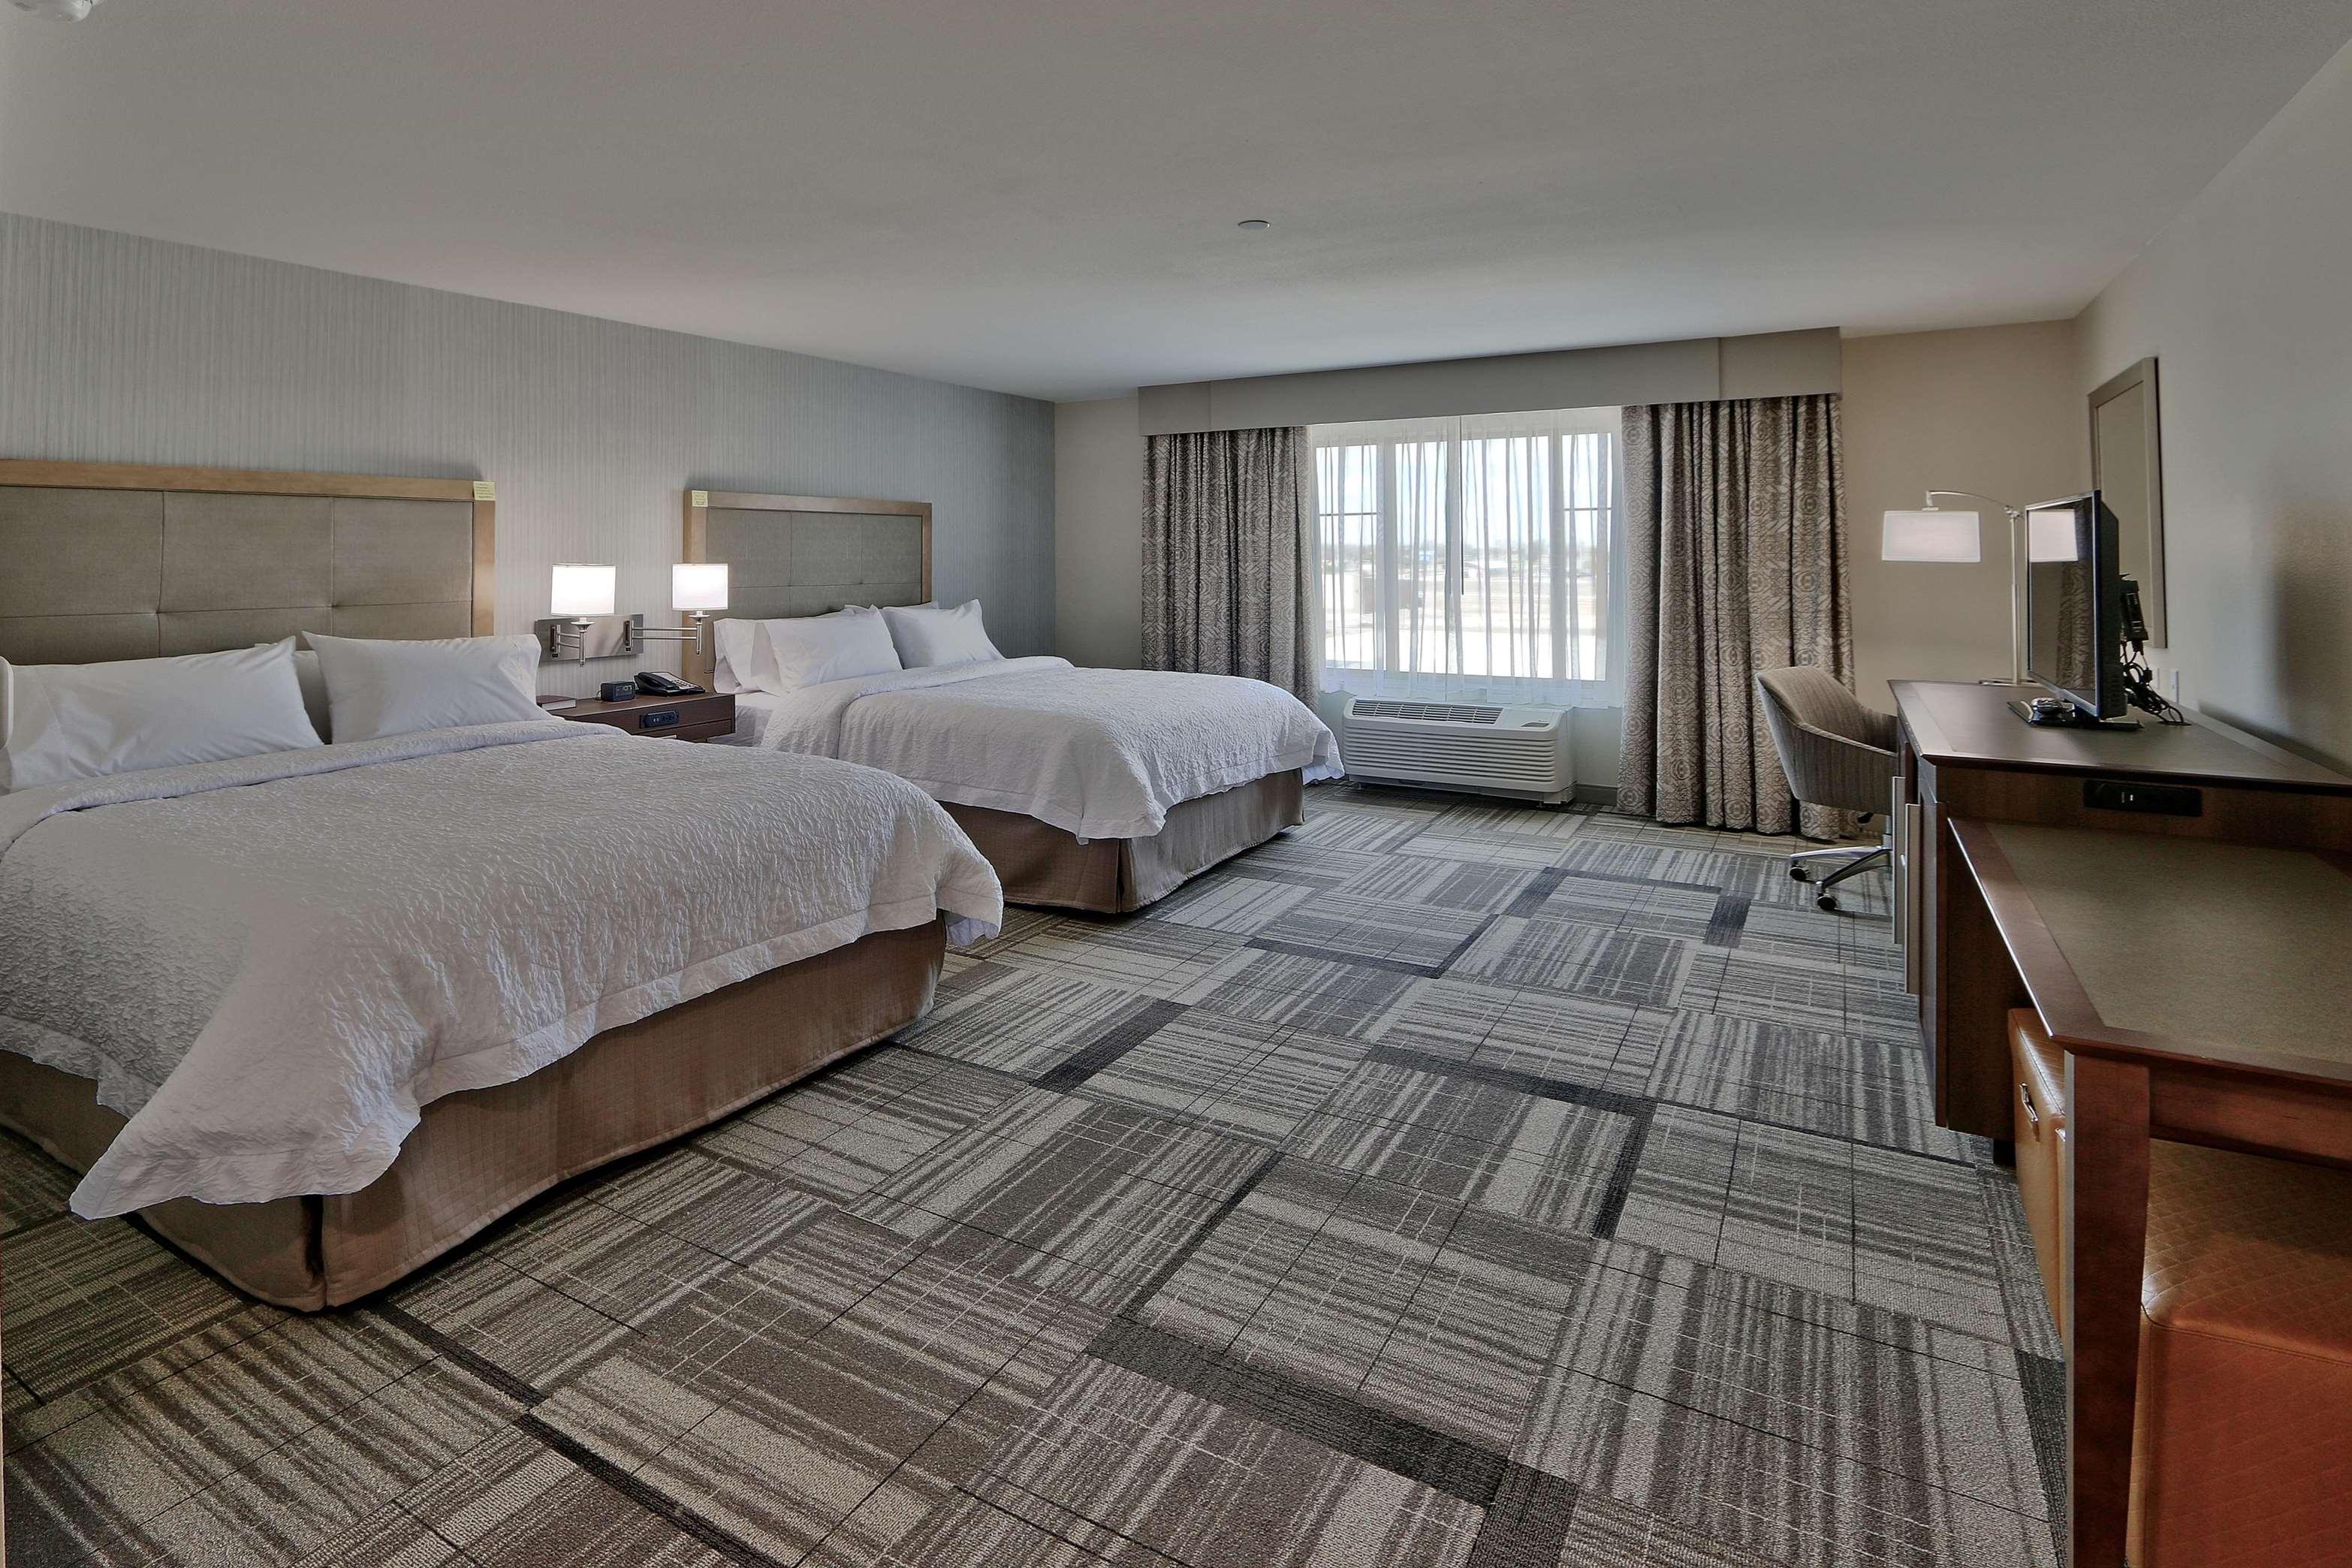 Hampton Inn & Suites Artesia image 11